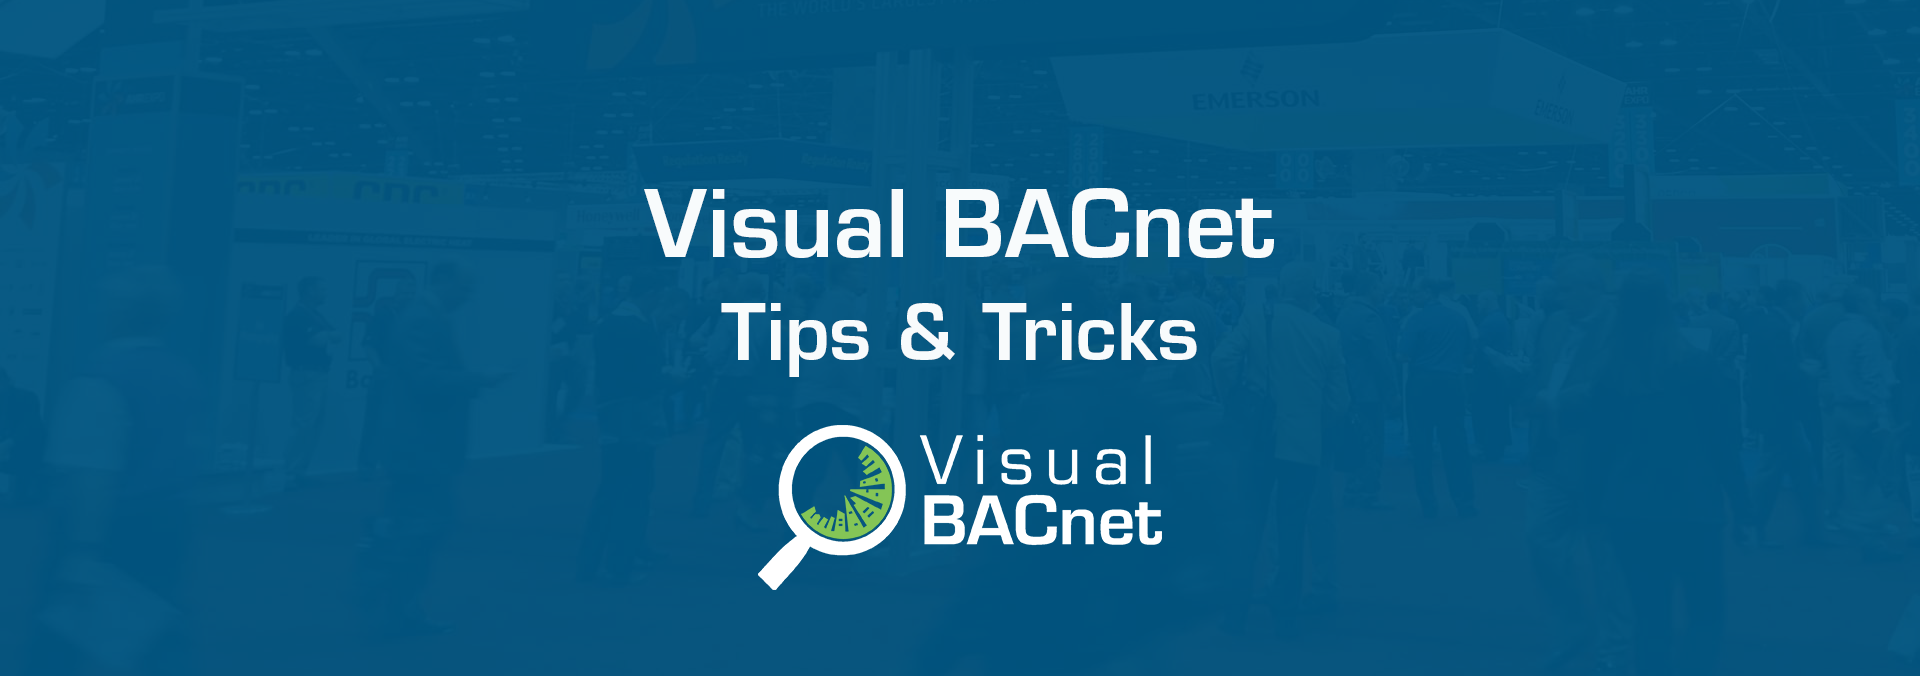 Finding duplicate device IDs in VisualBACnet